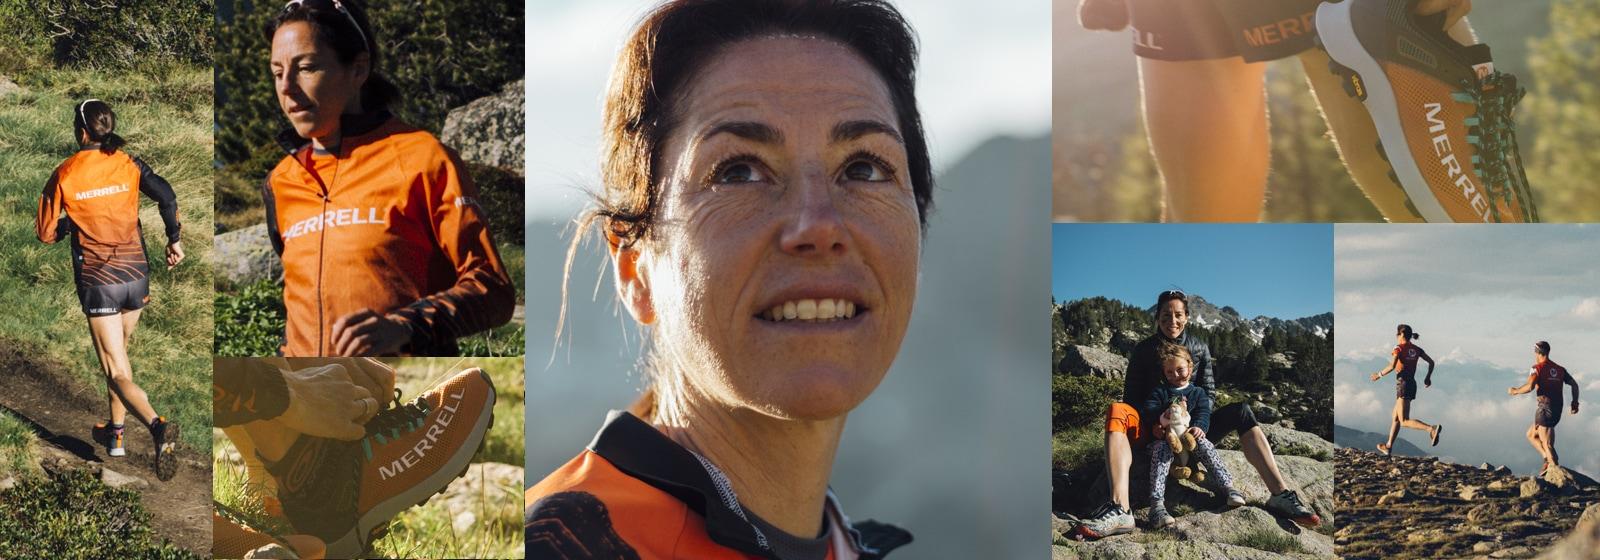 A collage of photos of the Merrell MTL Long Sky and Ranga Debats